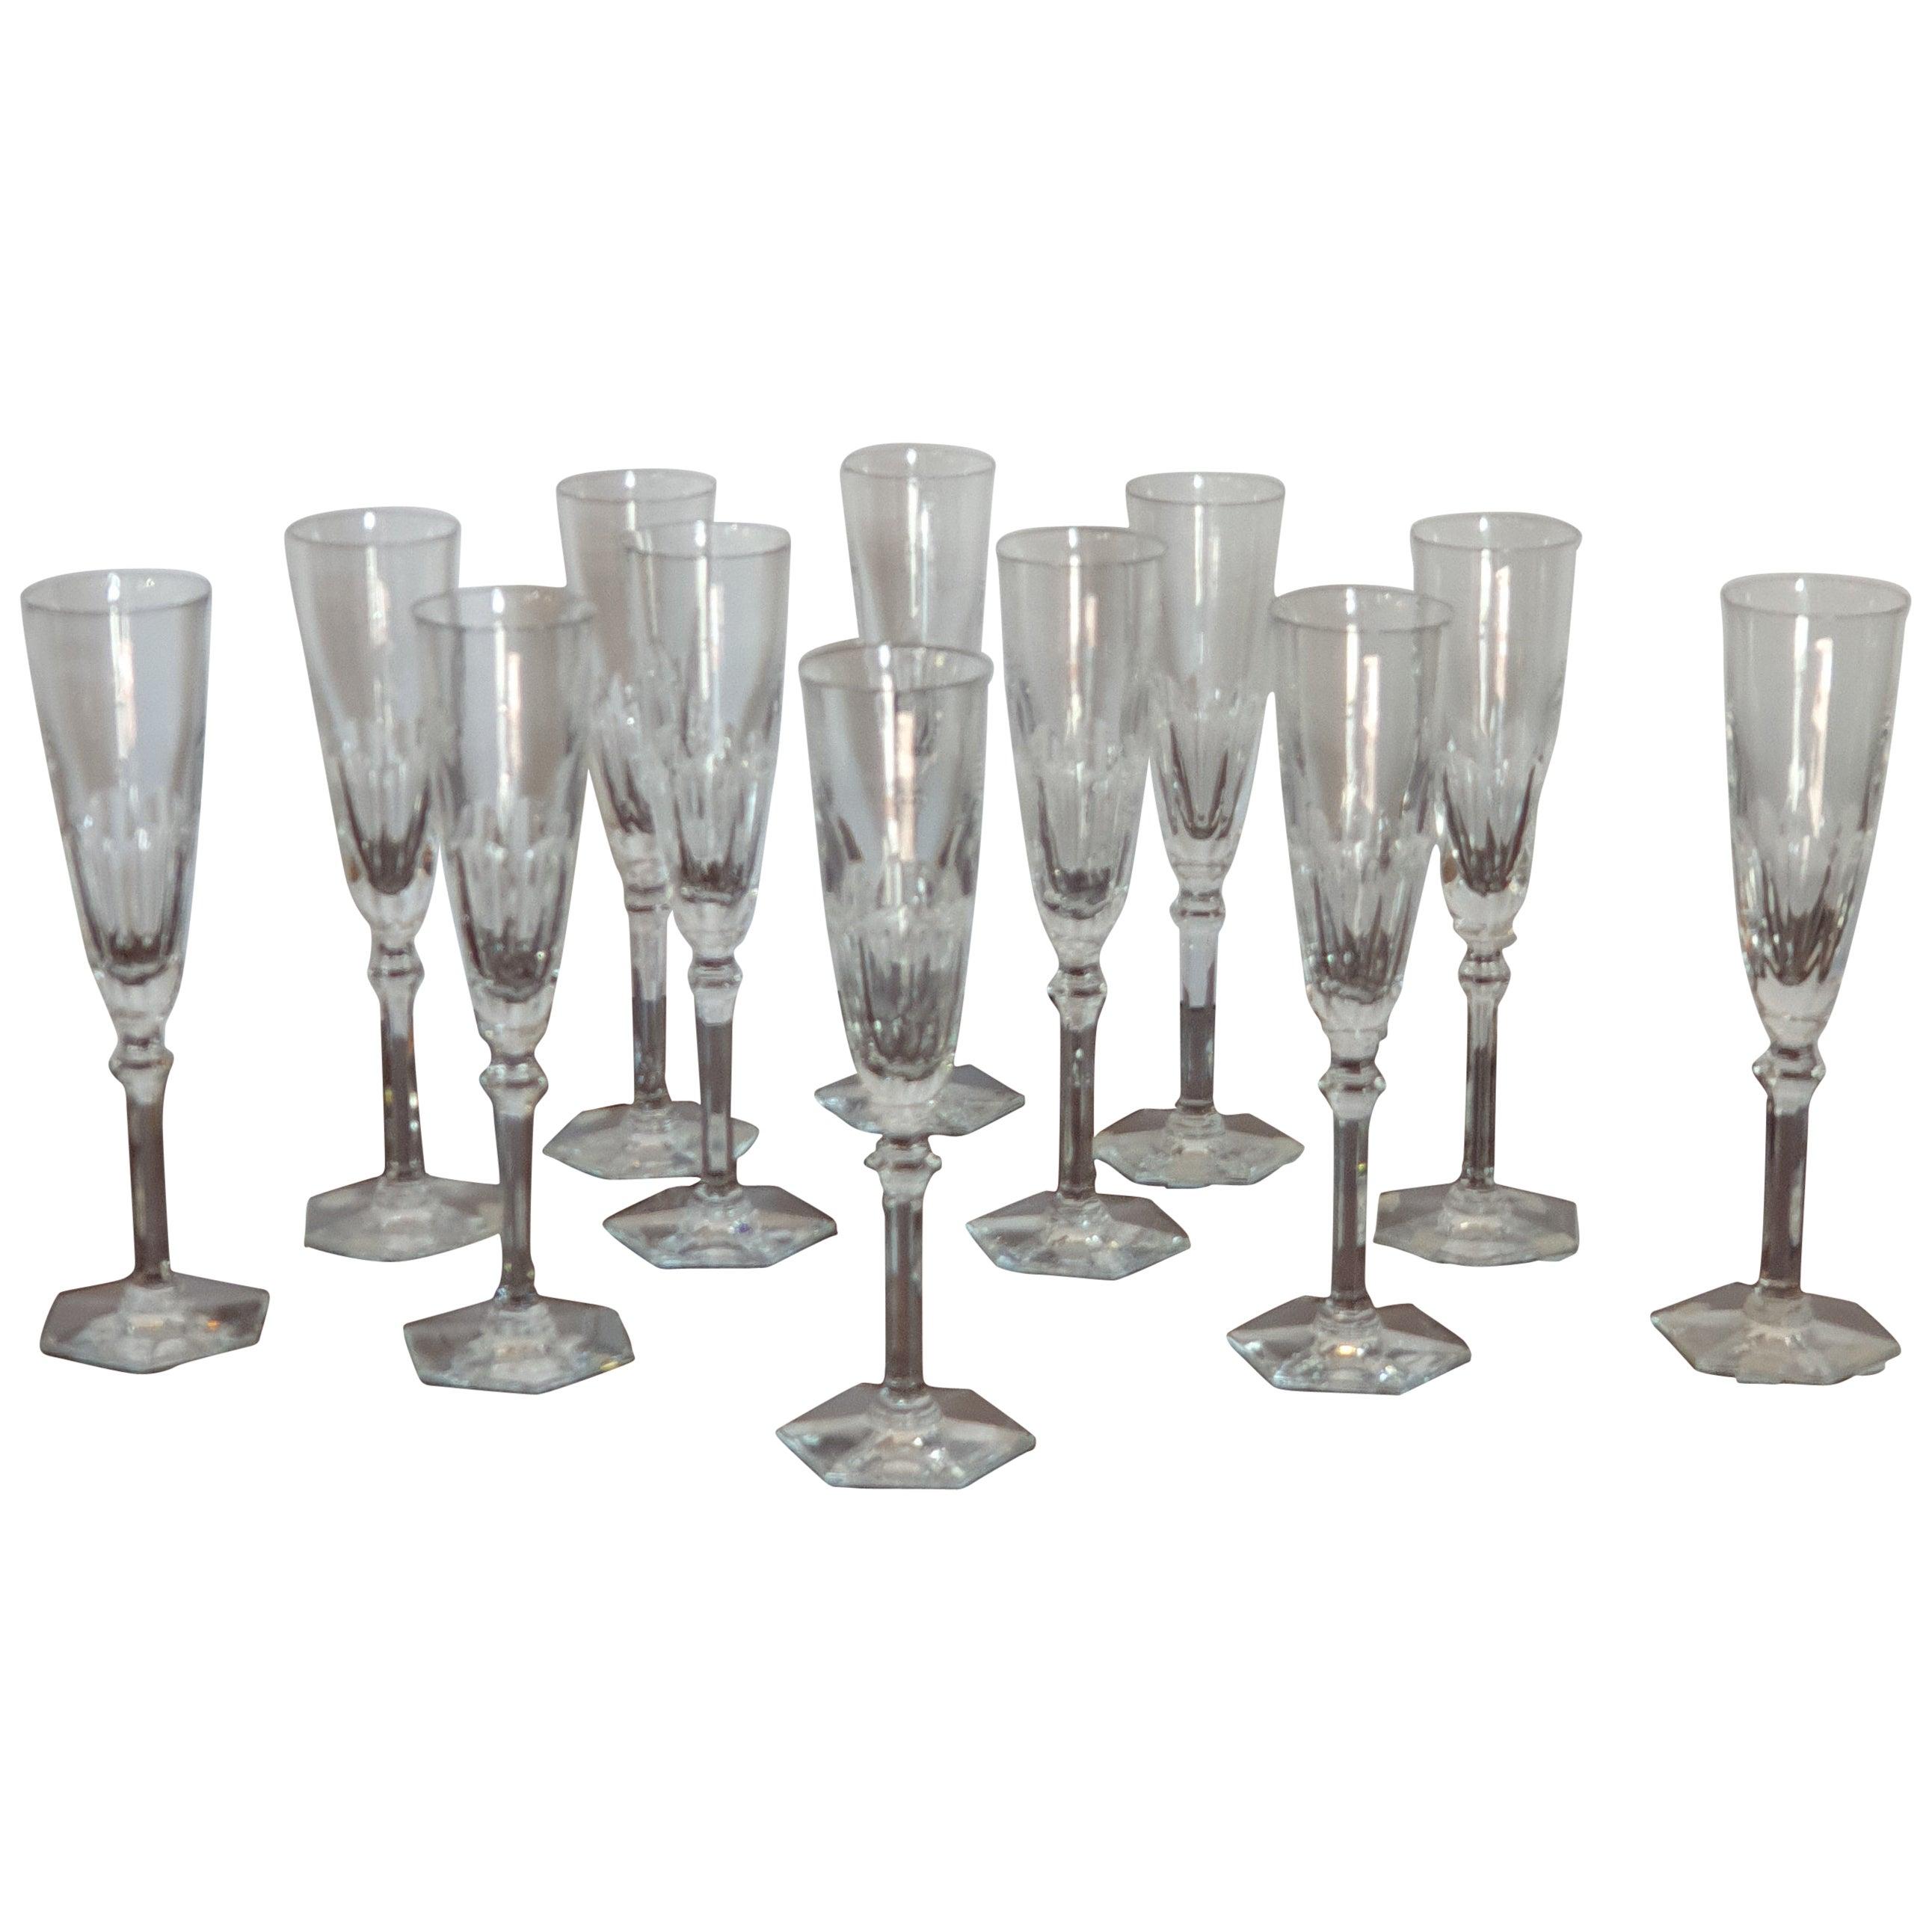 "Set of Baccarat Crystal 12 Champagne Flutes ""Harcourt Eve"" Stemware, France, New"